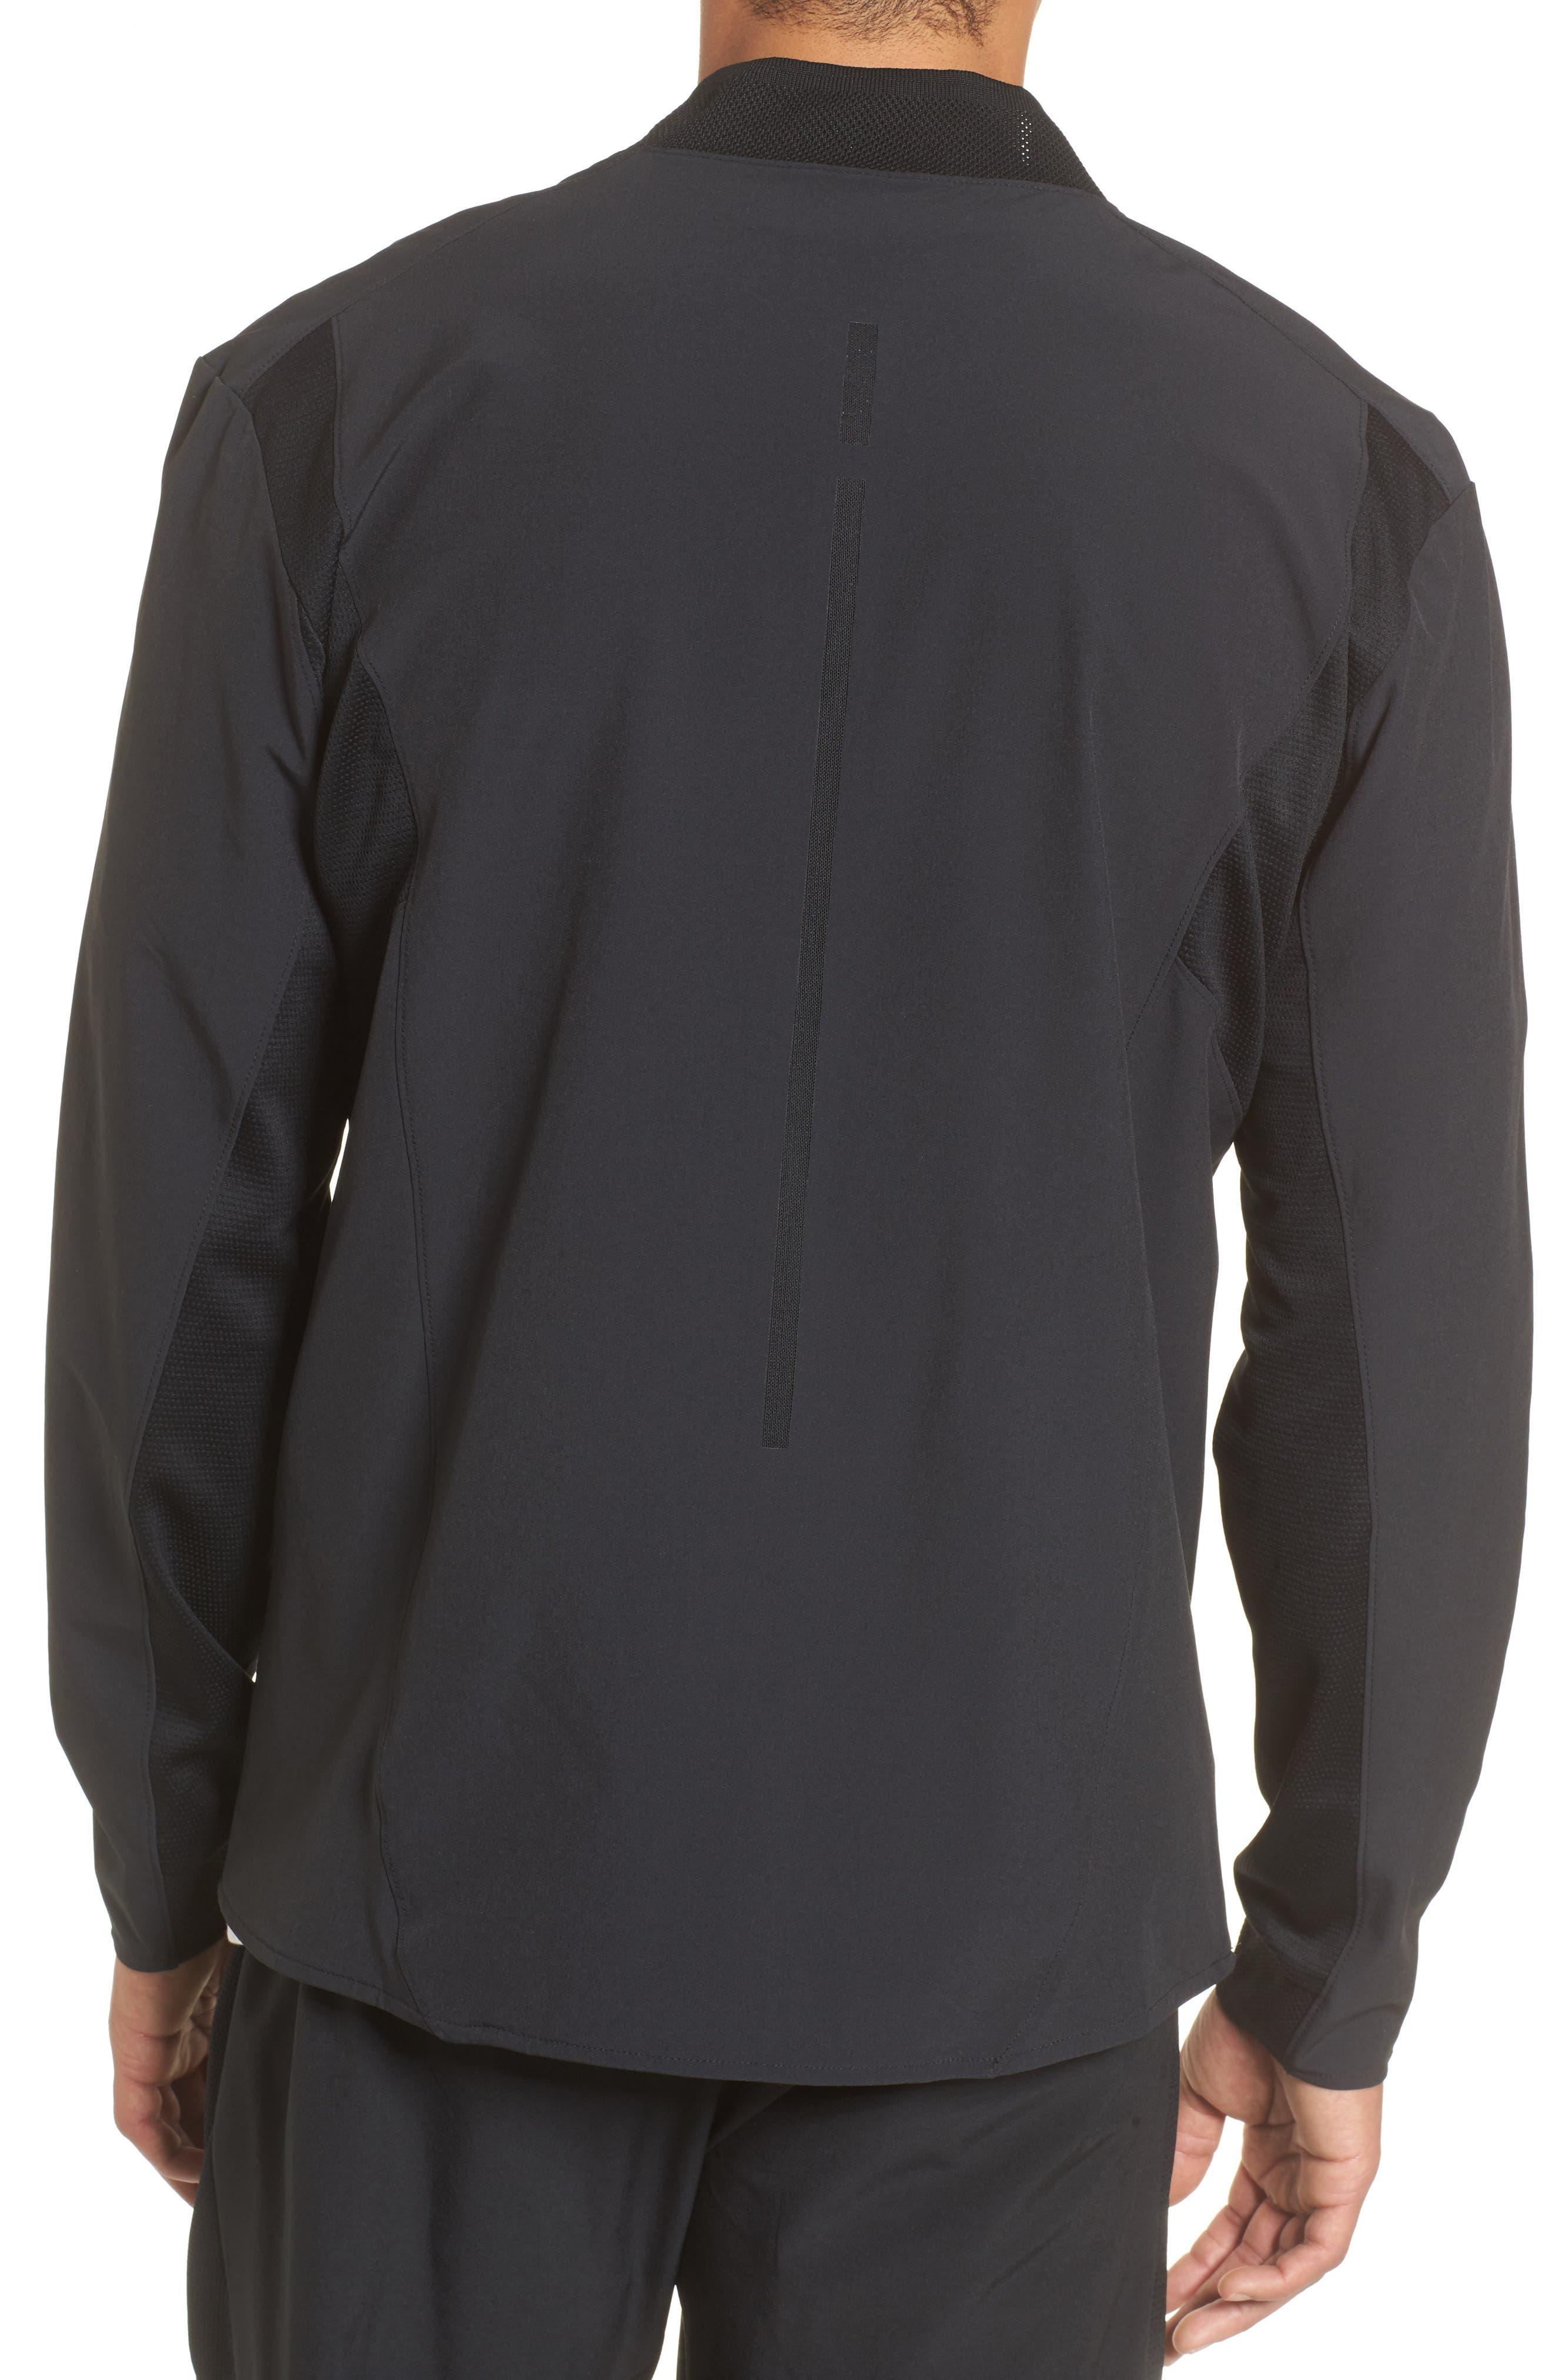 23 Alpha Dry Jacket,                             Alternate thumbnail 2, color,                             010